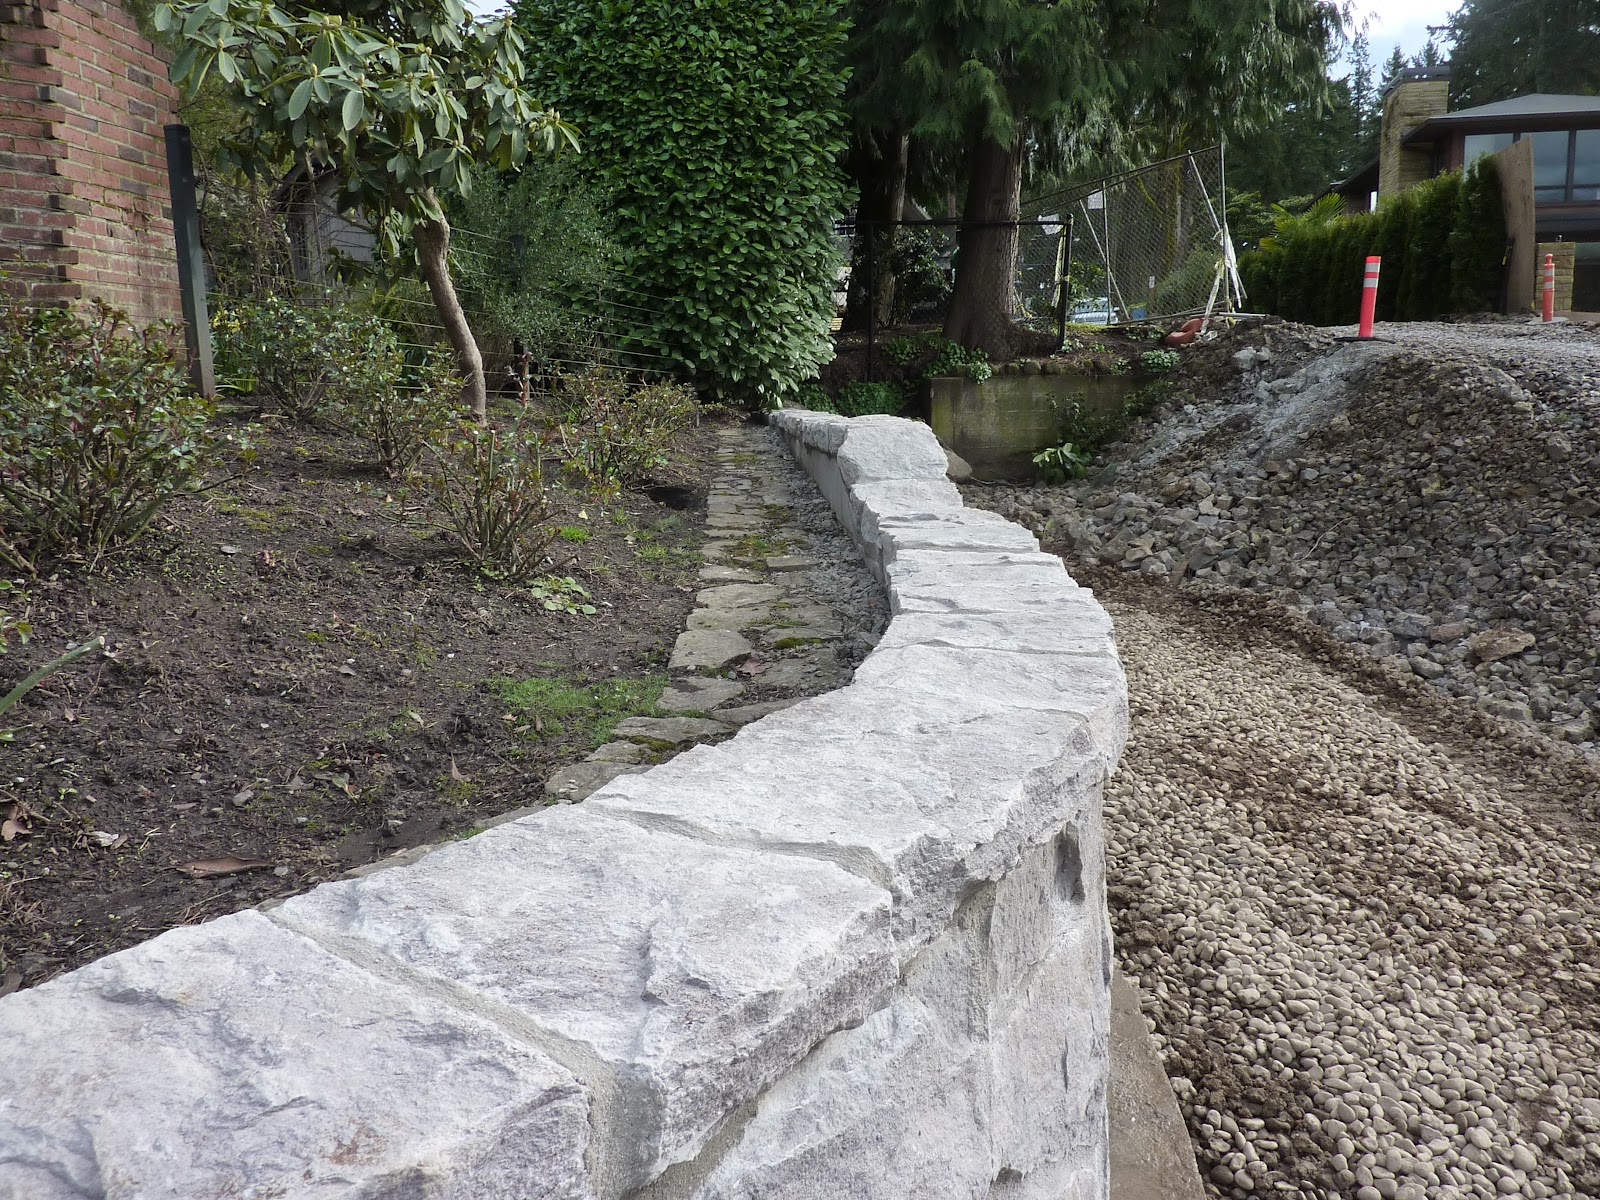 Granite Block Seawall : Boisineau masonry a few projects from continued